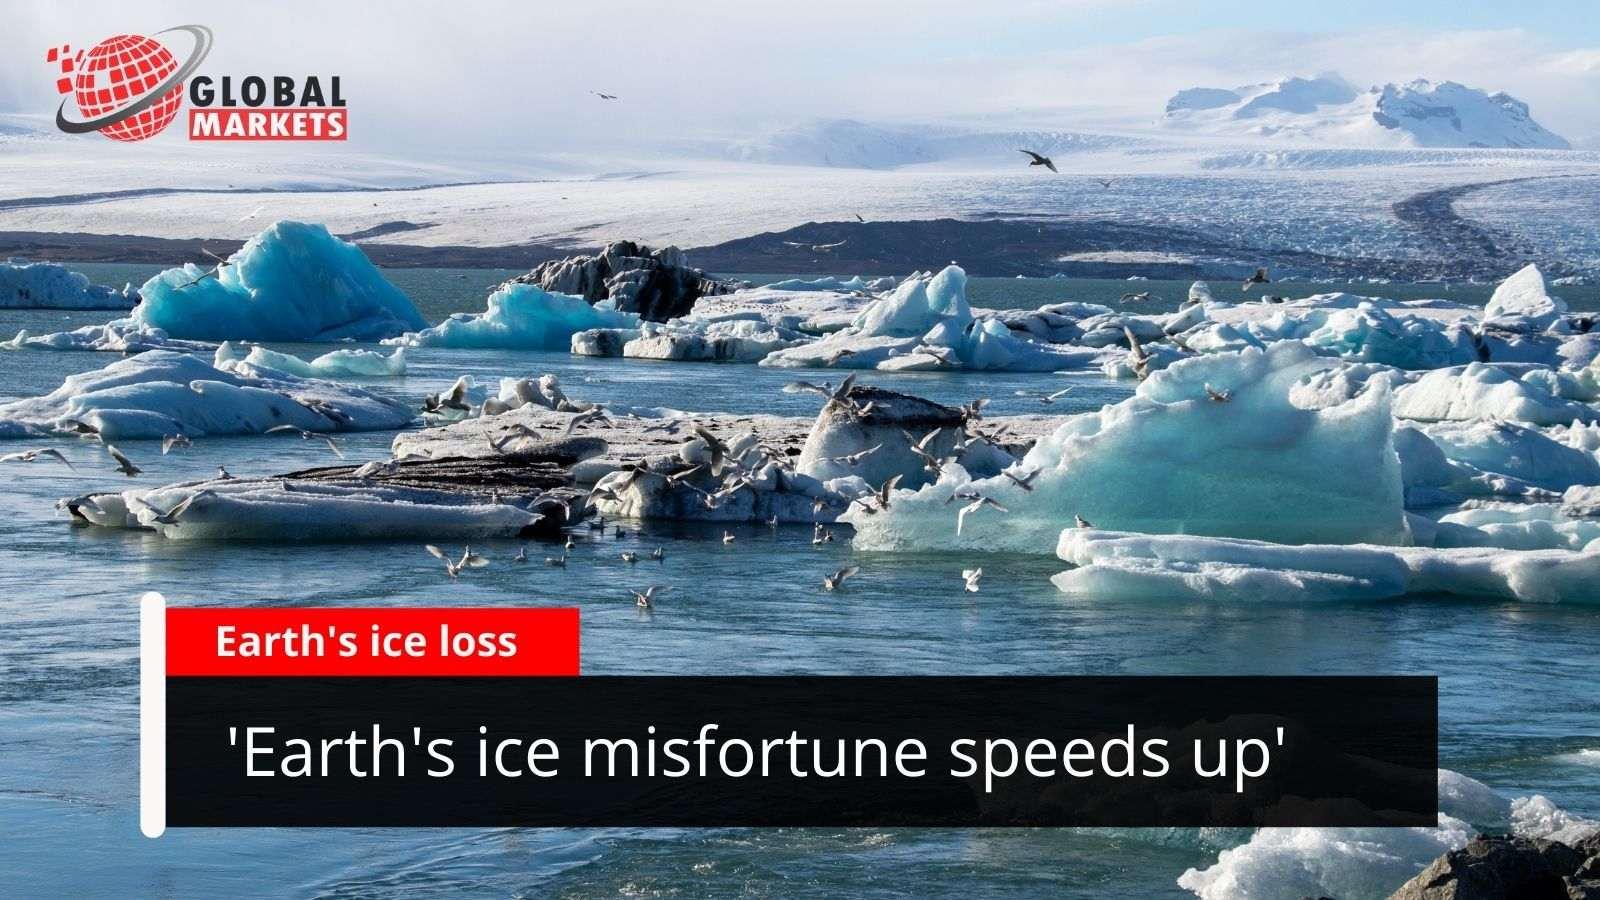 'Earth's ice misfortune speeds up'